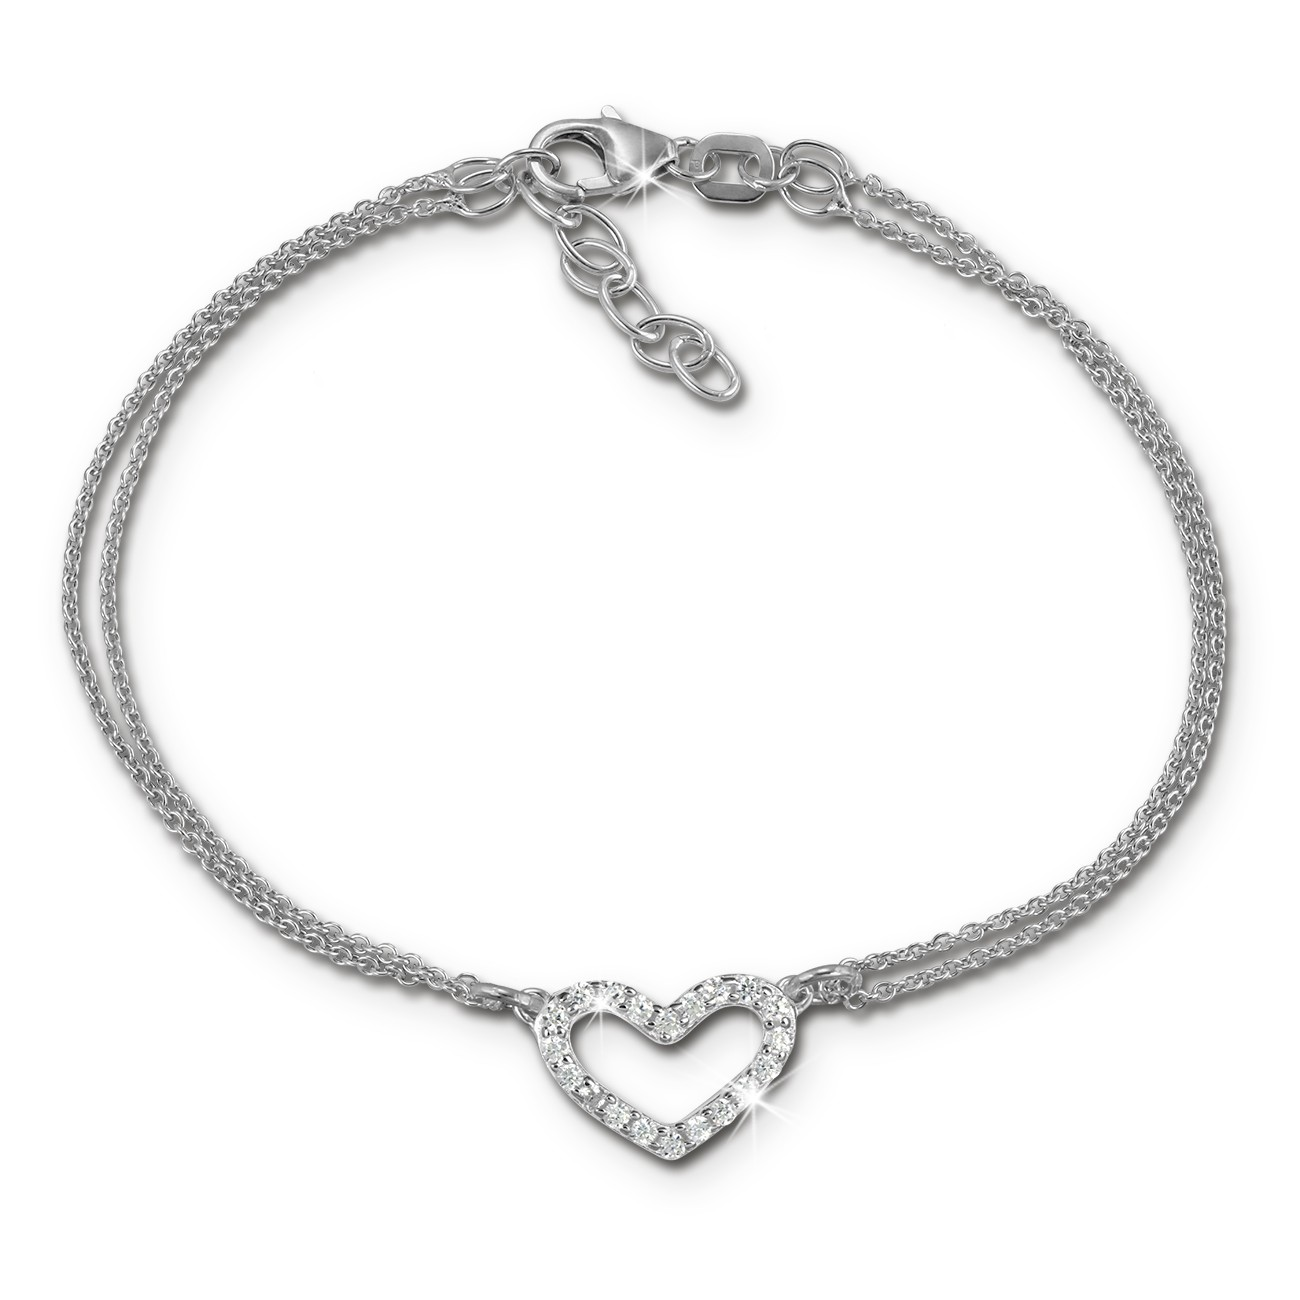 SilberDream Armband Herz Zirkonia weiß 17cm - 19cm 925er Silber Damen SDA2597J